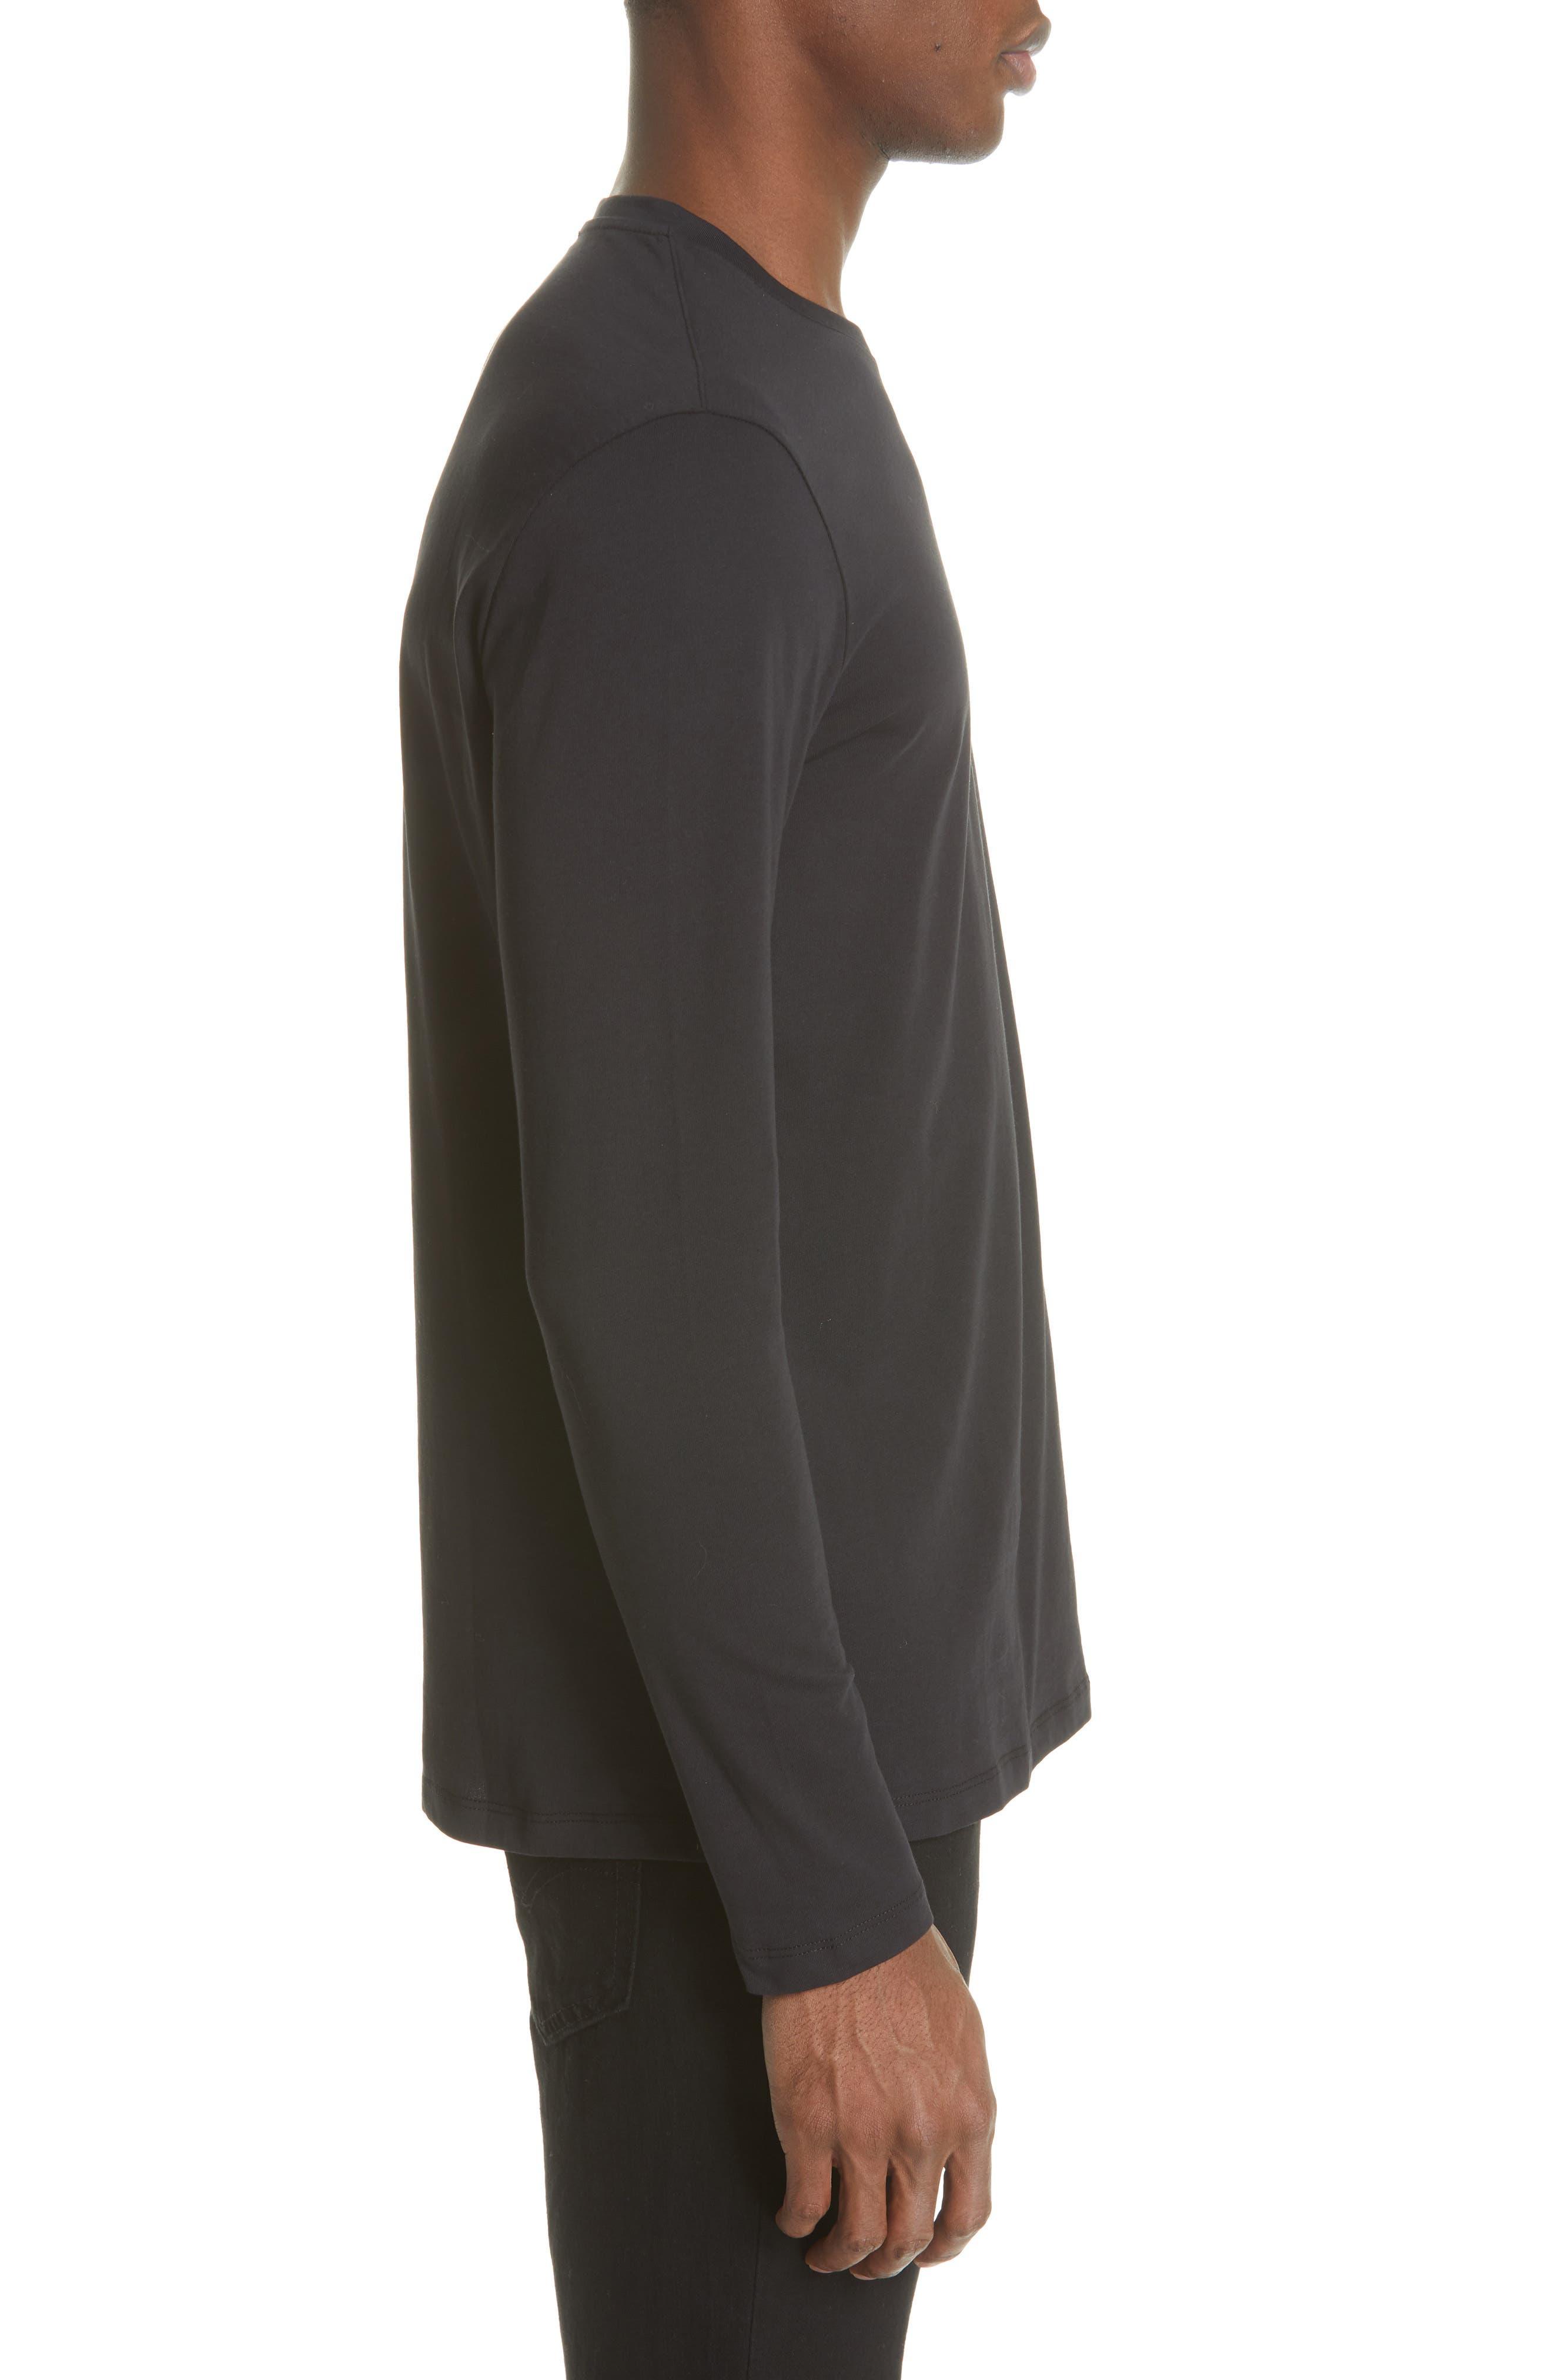 VERSACE COLLECTION,                             Medusa Long Sleeve T-Shirt,                             Alternate thumbnail 3, color,                             BLACK